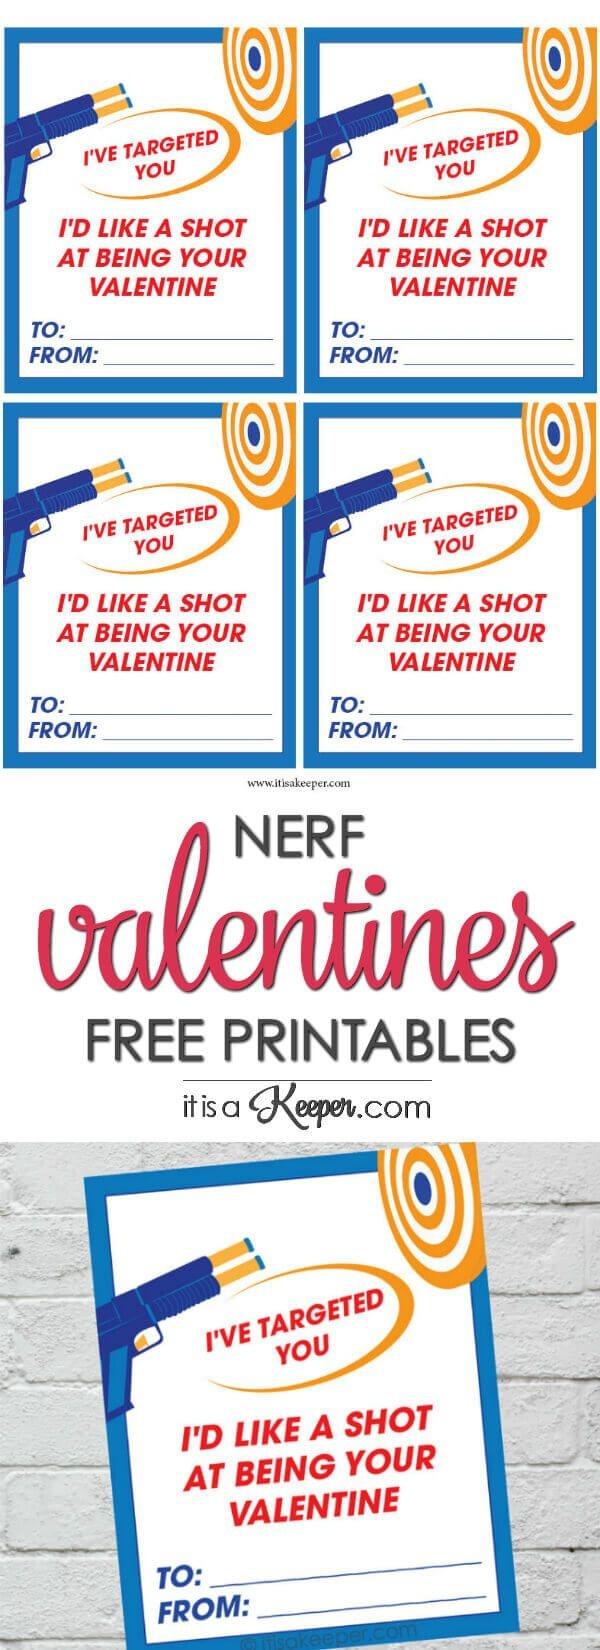 Nerf Valentine Printables - Free Printable Nerf Themed Valentines - Free Nerf Printables